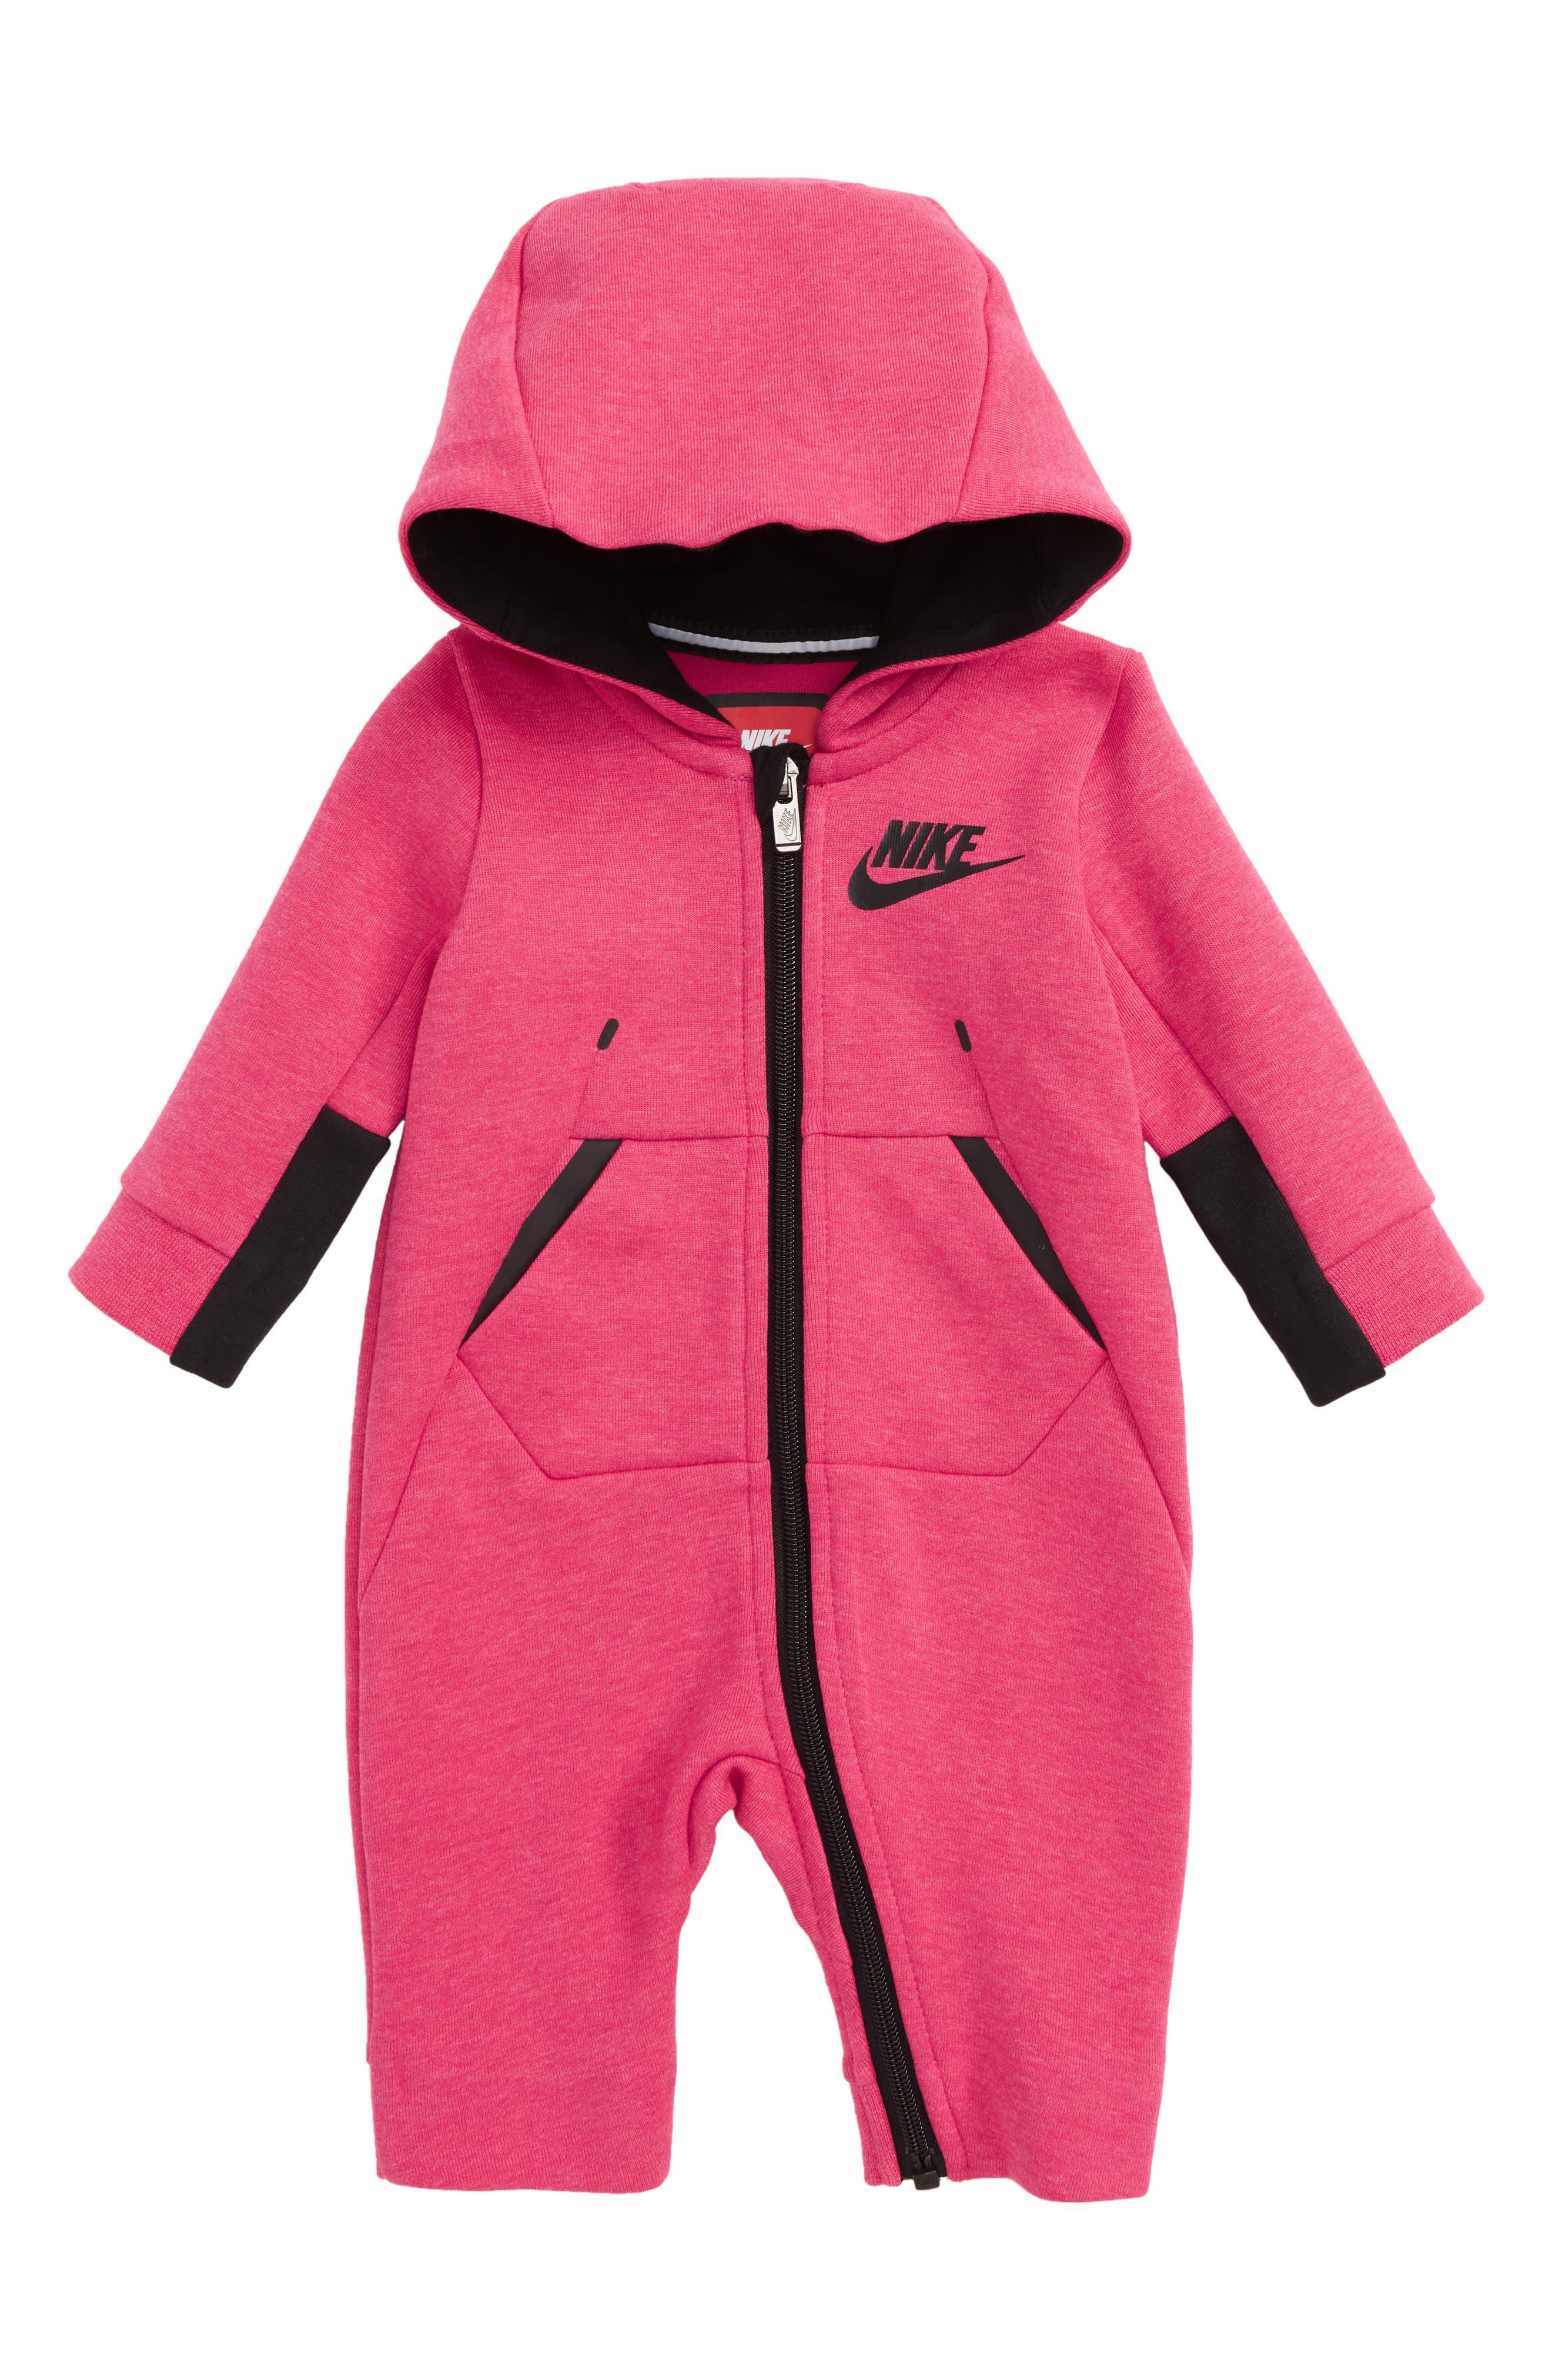 Tech Fleece Hooded Romper,                         Main,                         color,